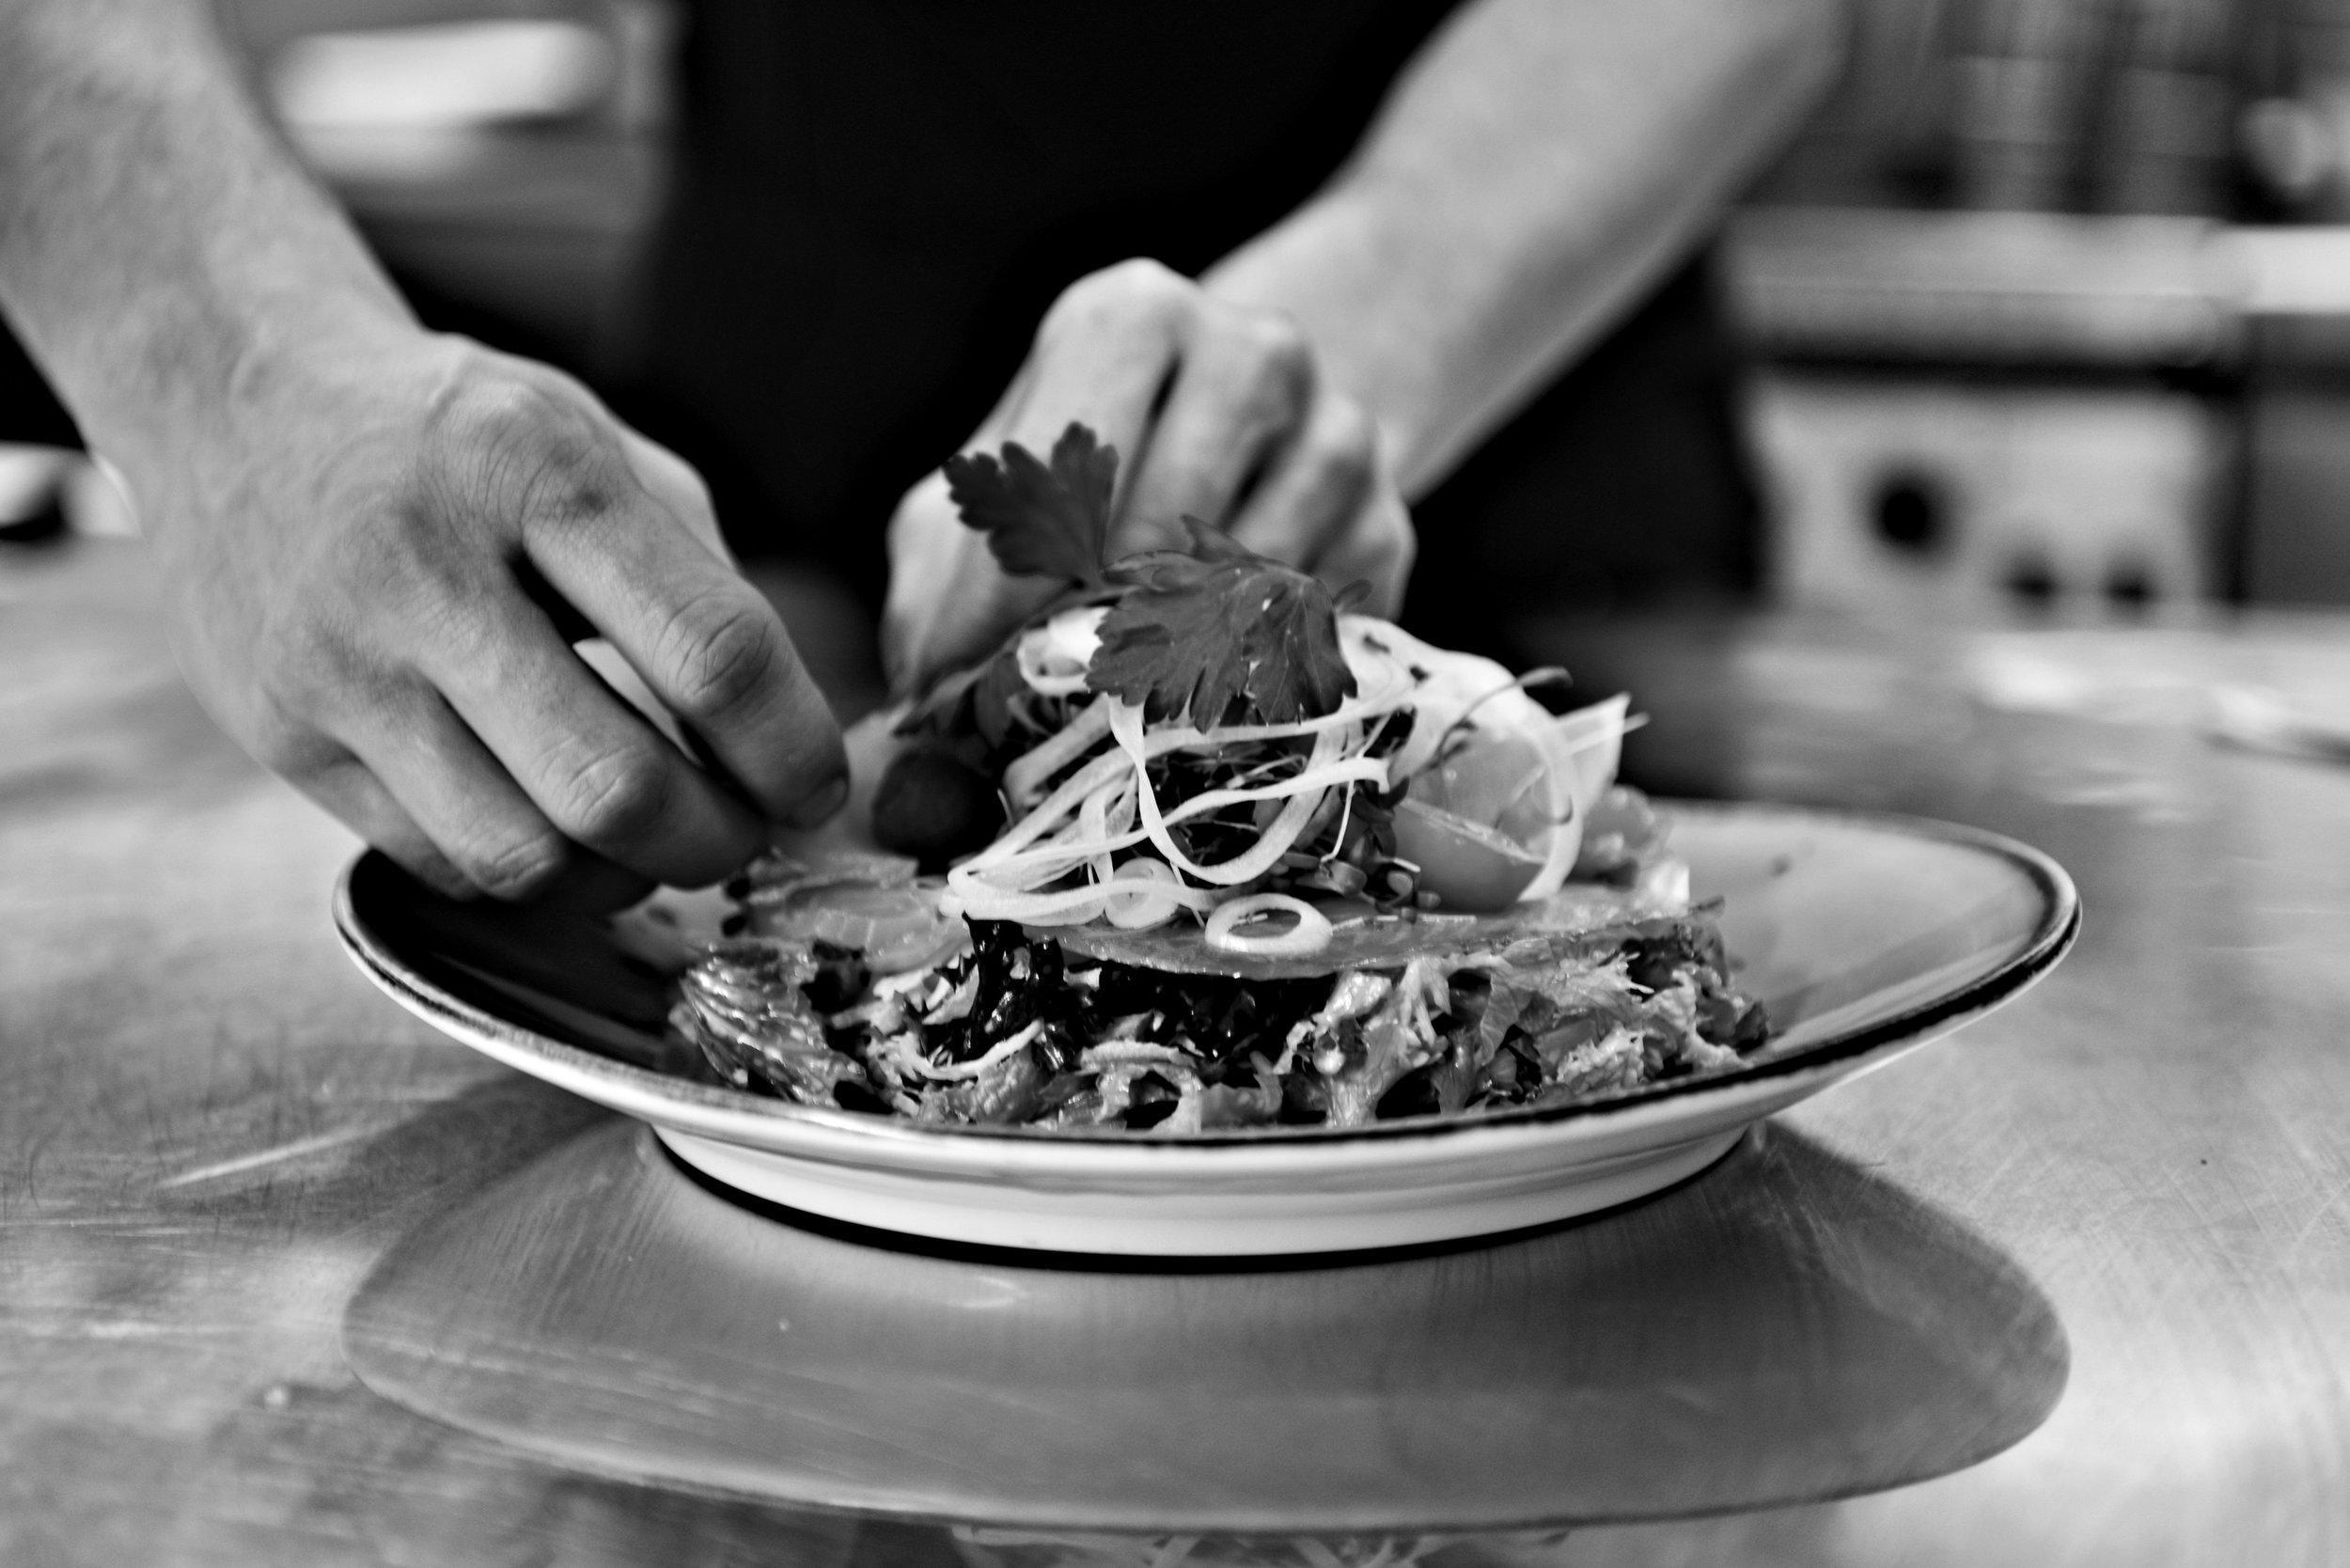 13 restuarant brasserie t filet purreke pureke aalst steak pur tablefever .jpg